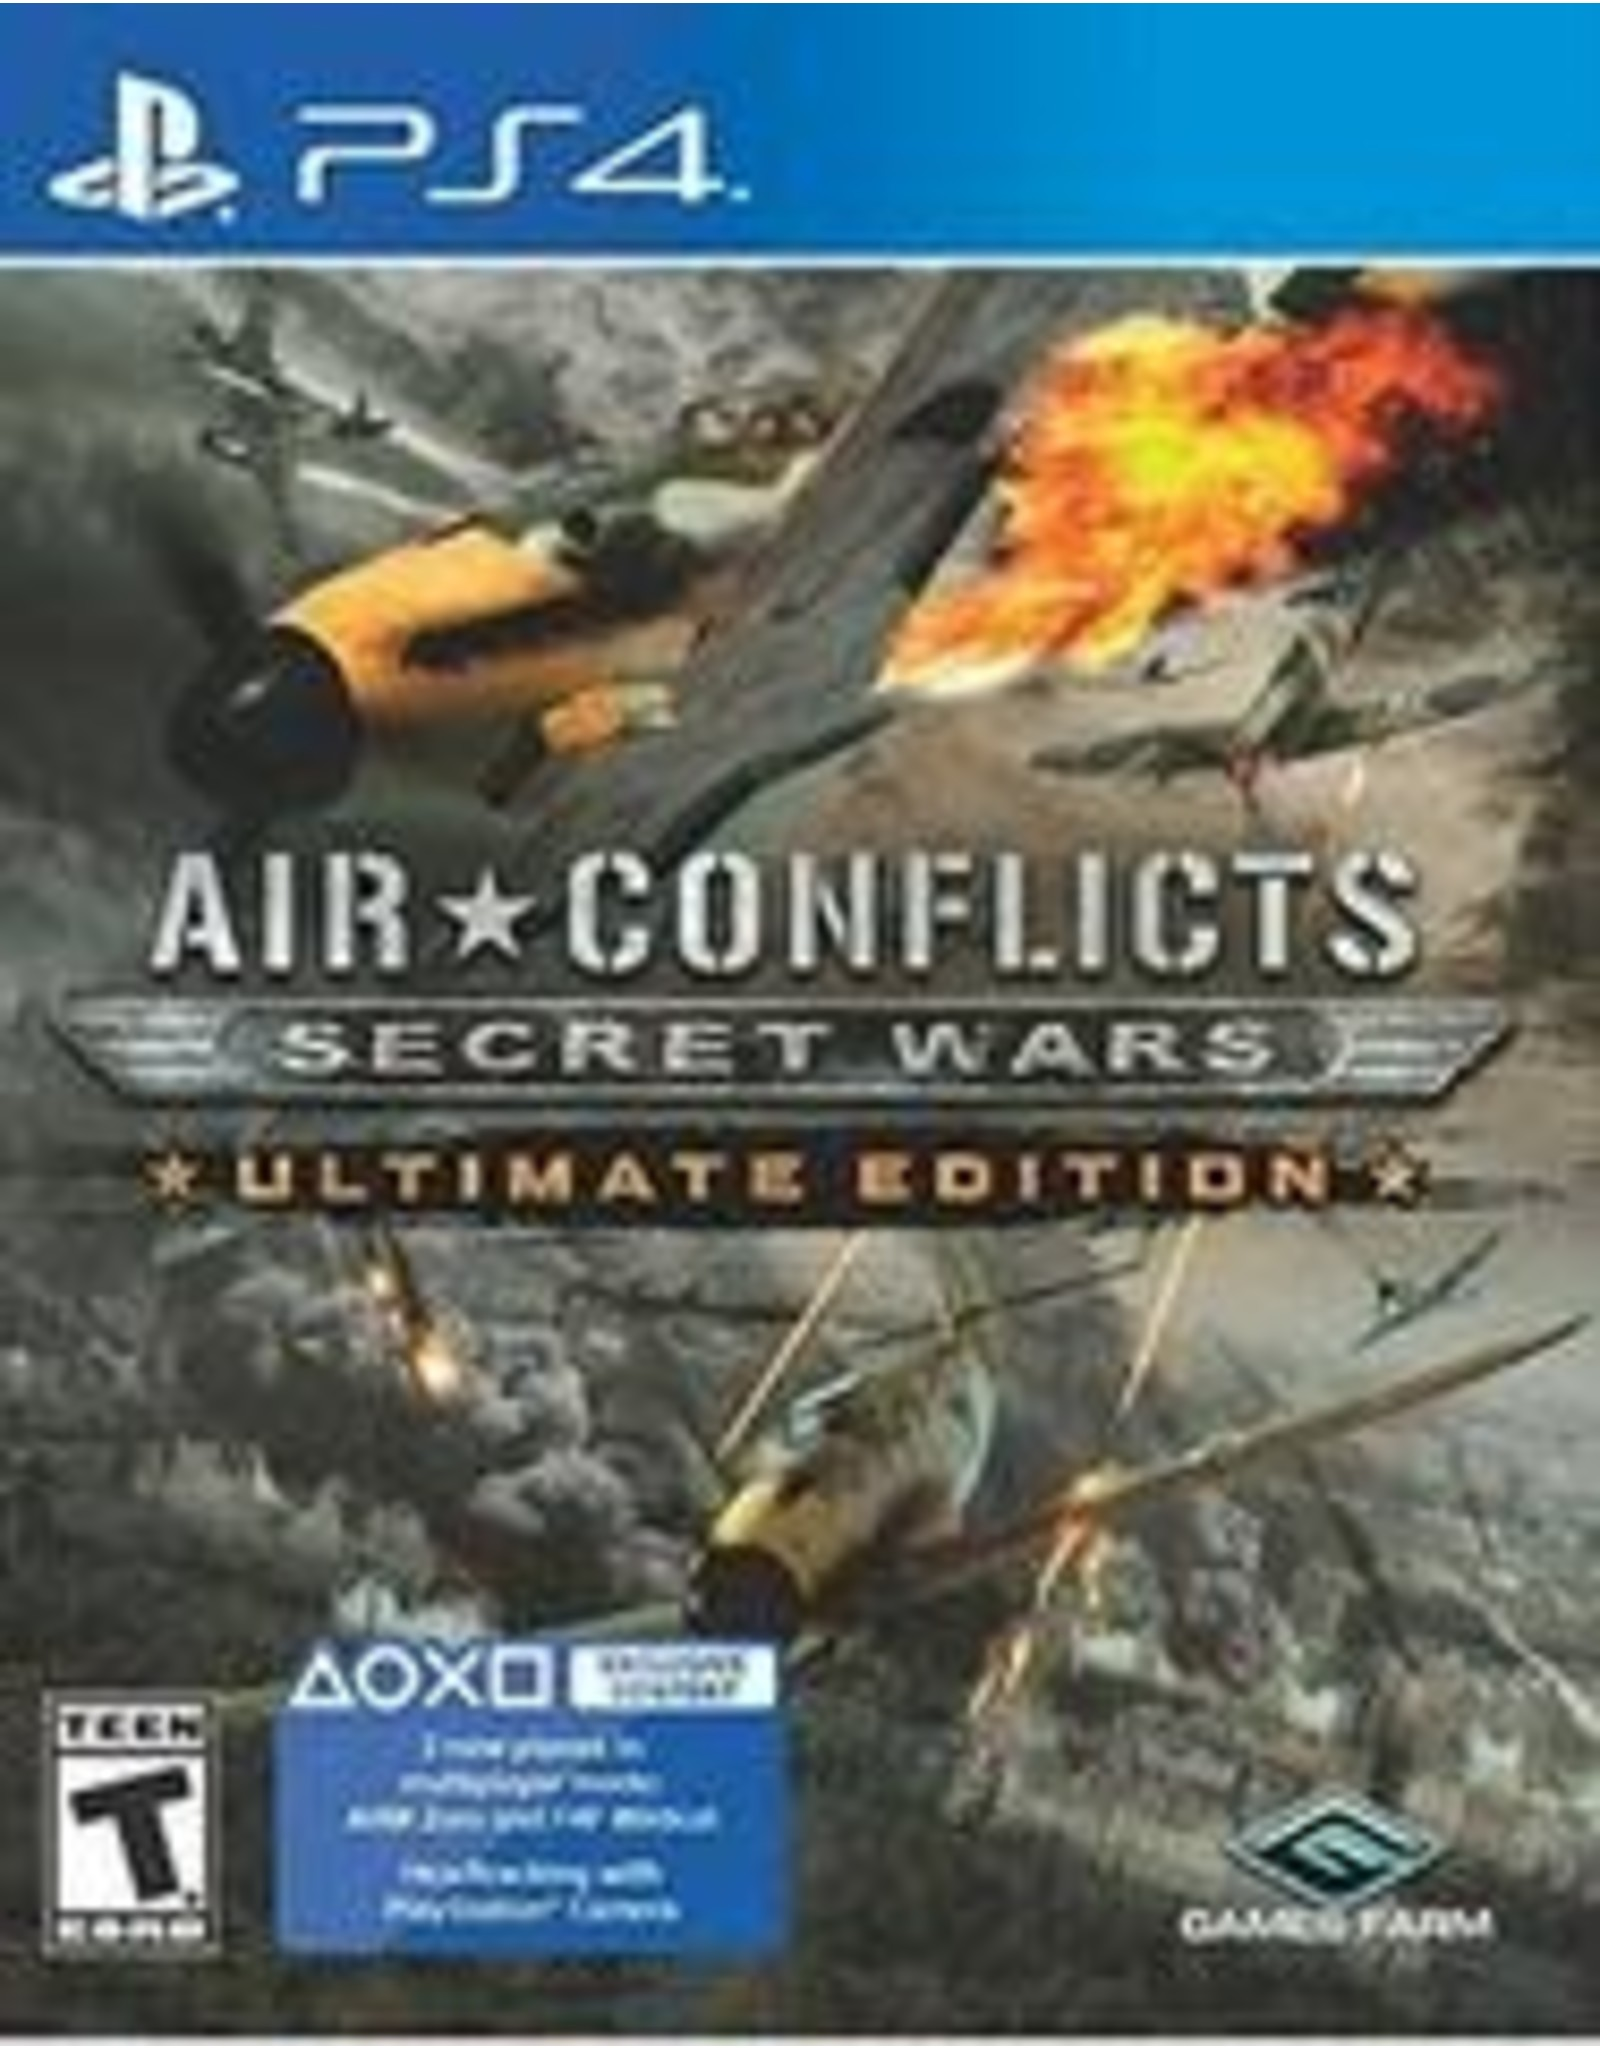 Playstation 4 Air Conflicts: Secret Wars (CiB)